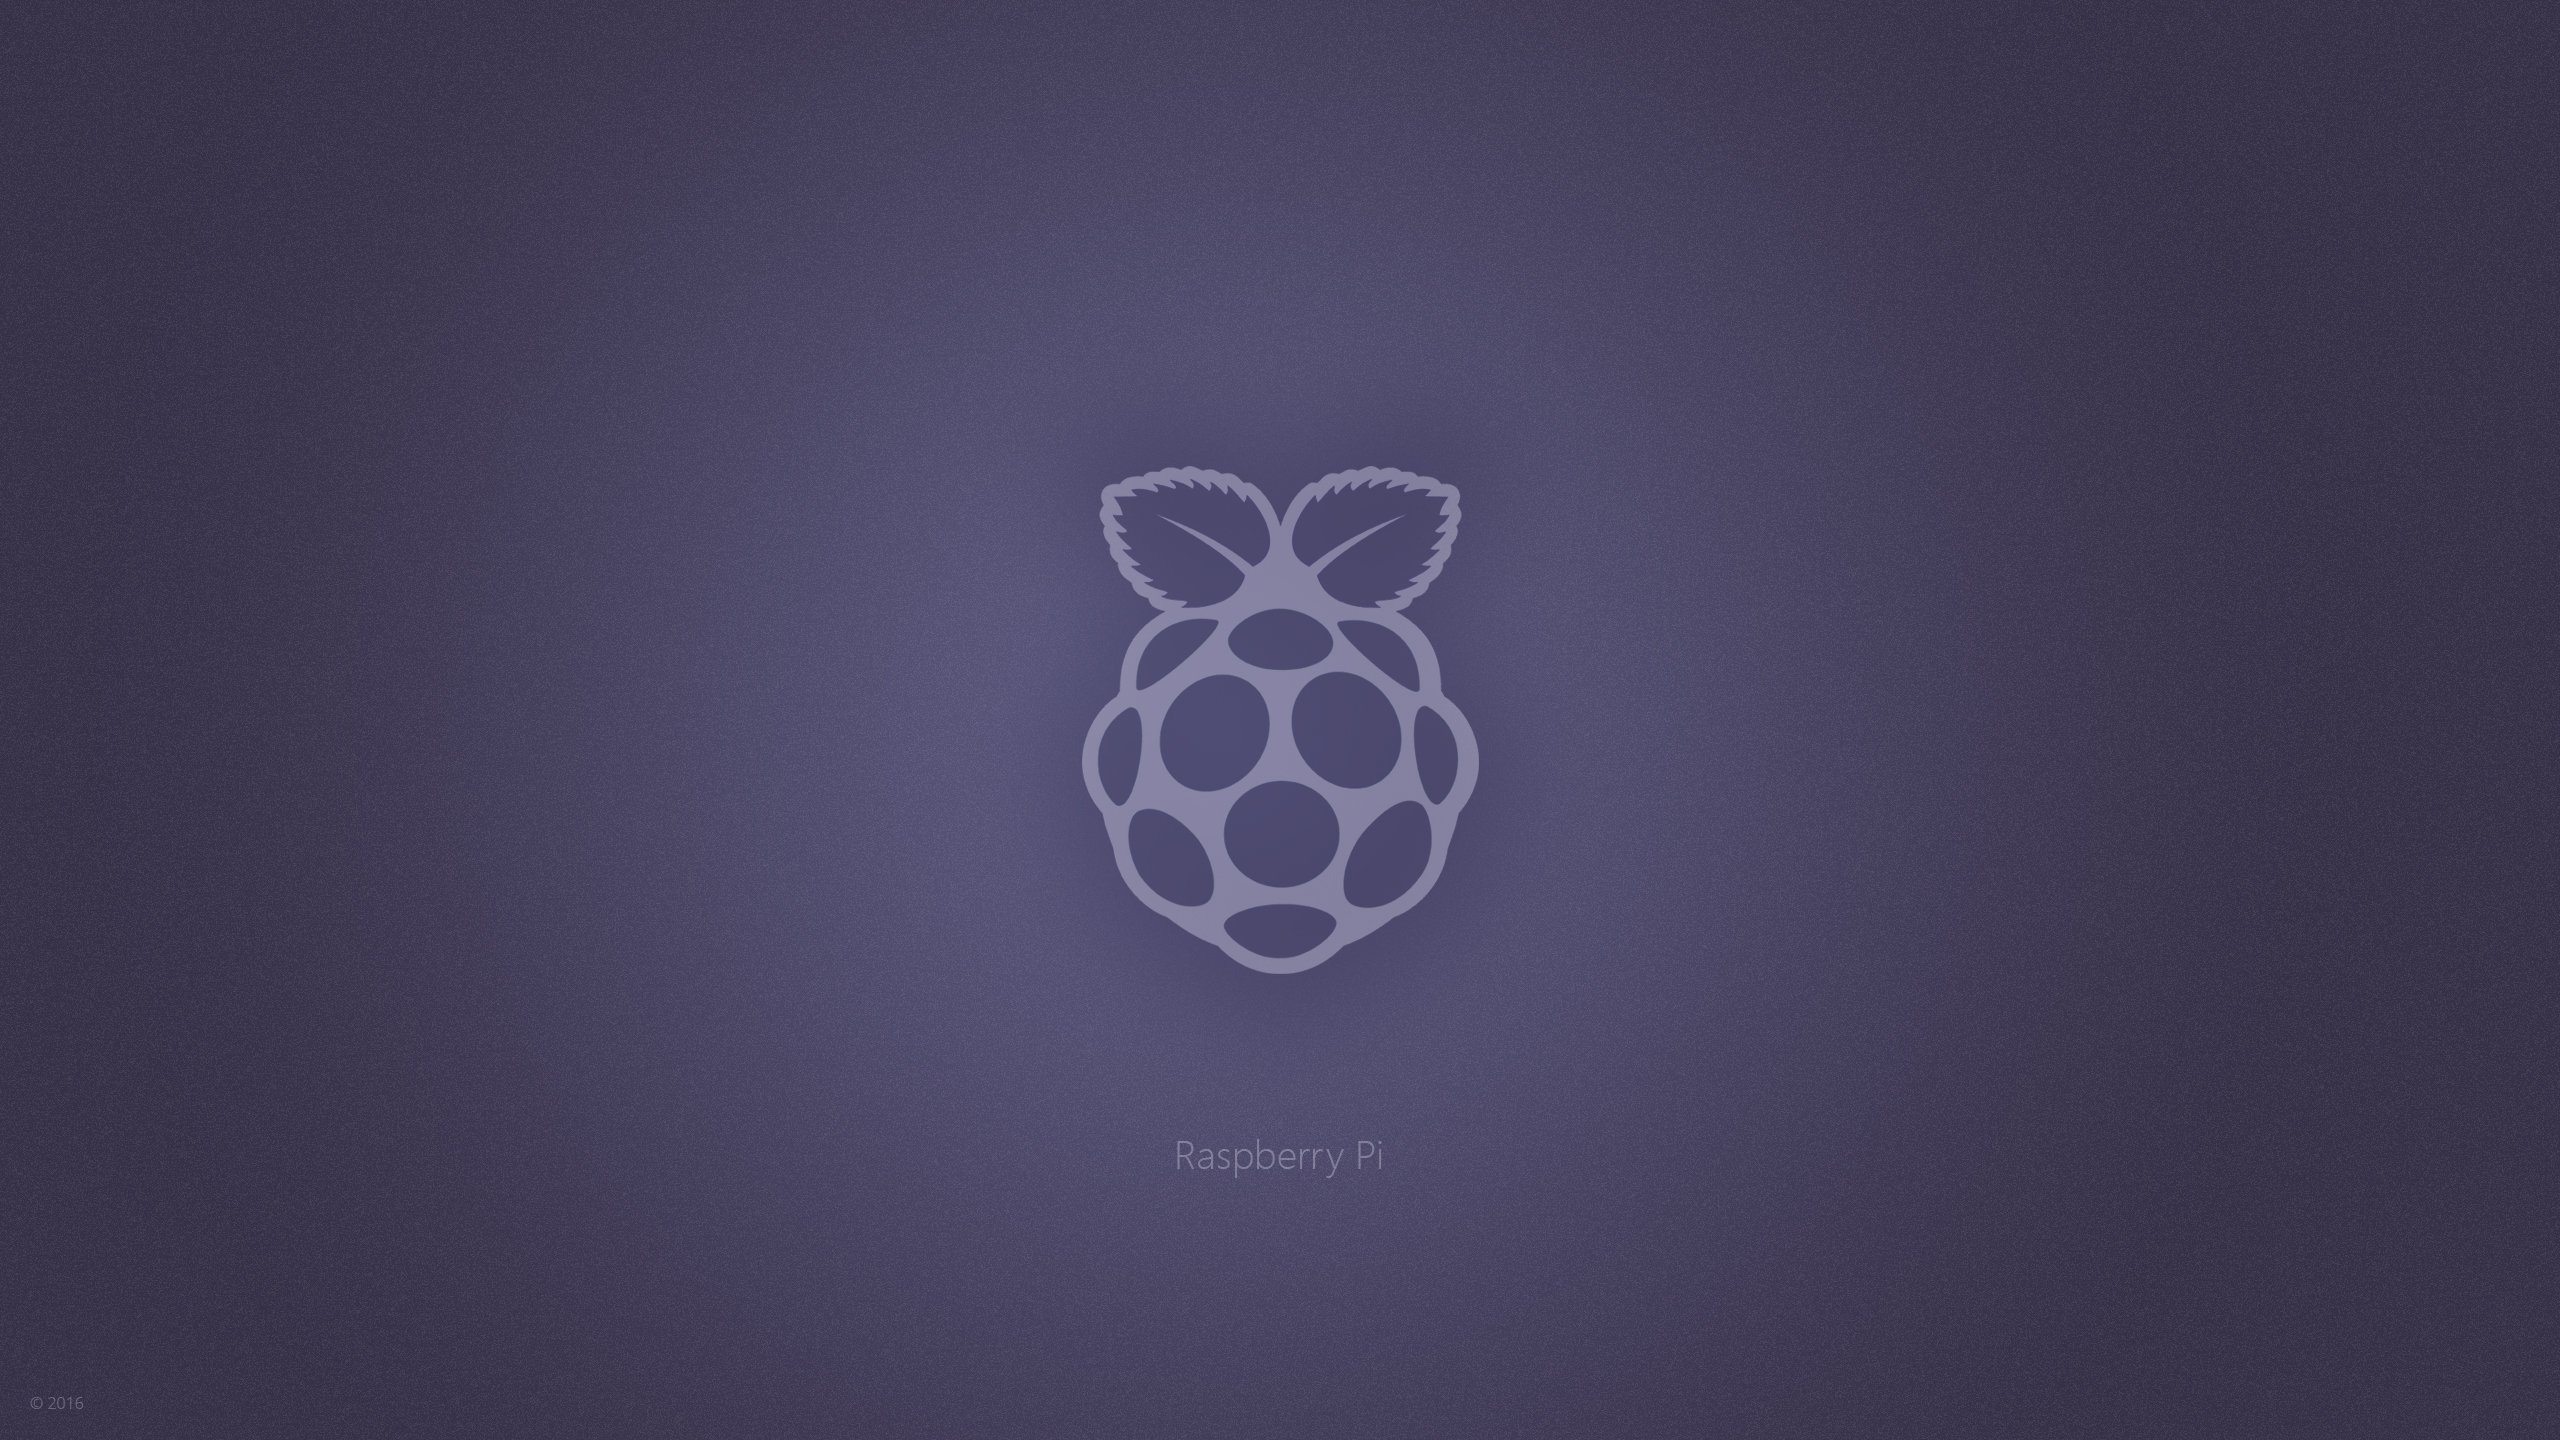 Le Raspberry Pi 3B+ est là